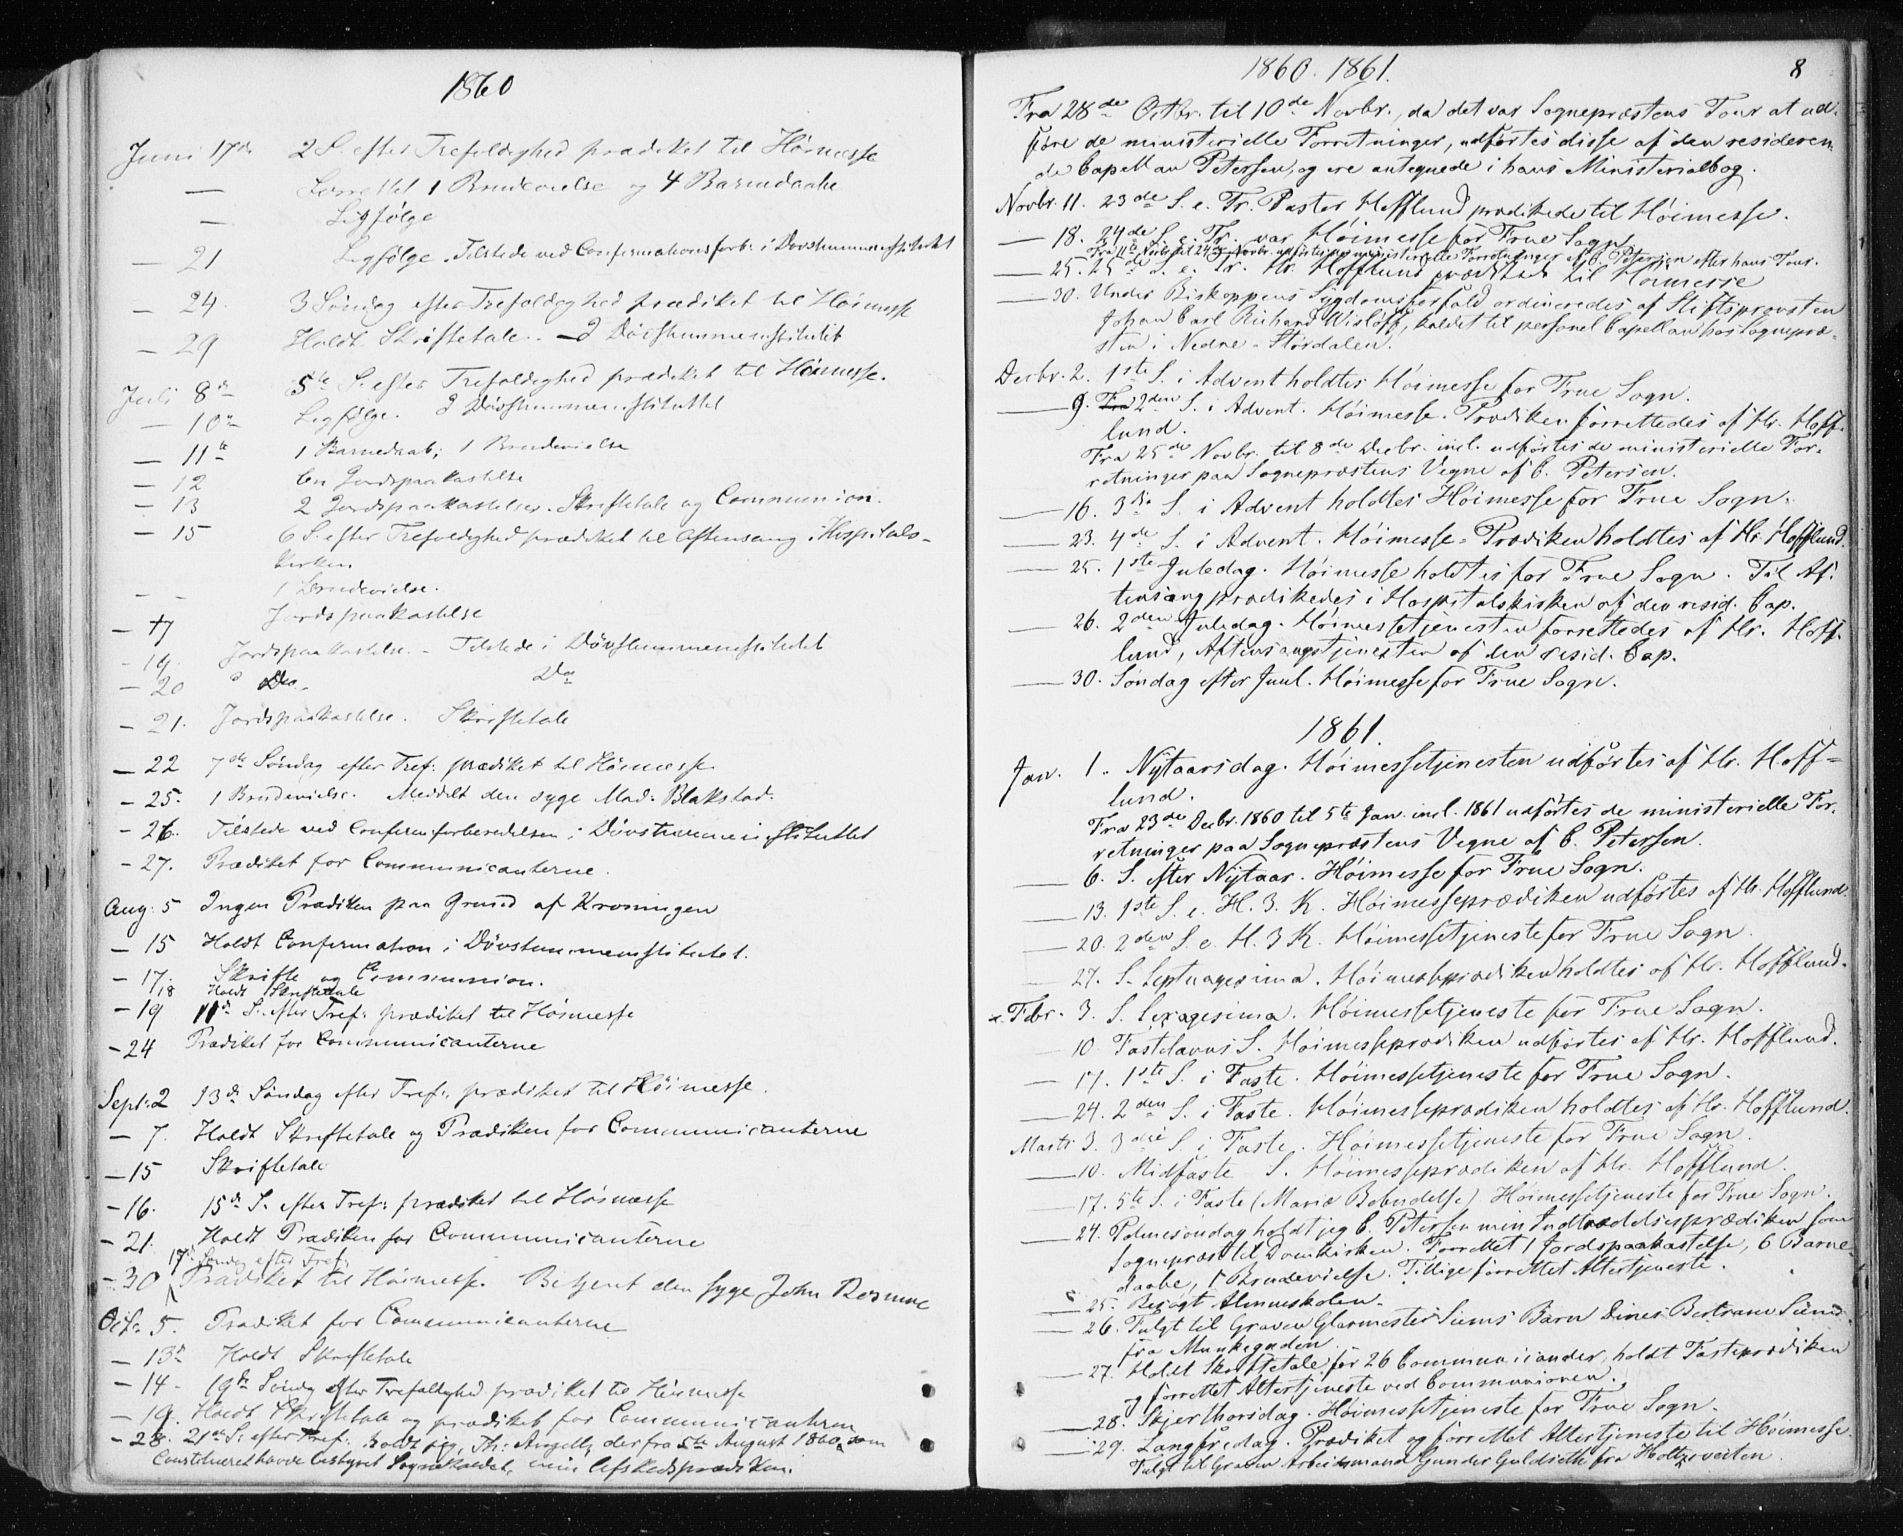 SAT, Ministerialprotokoller, klokkerbøker og fødselsregistre - Sør-Trøndelag, 601/L0053: Parish register (official) no. 601A21, 1857-1865, p. 8